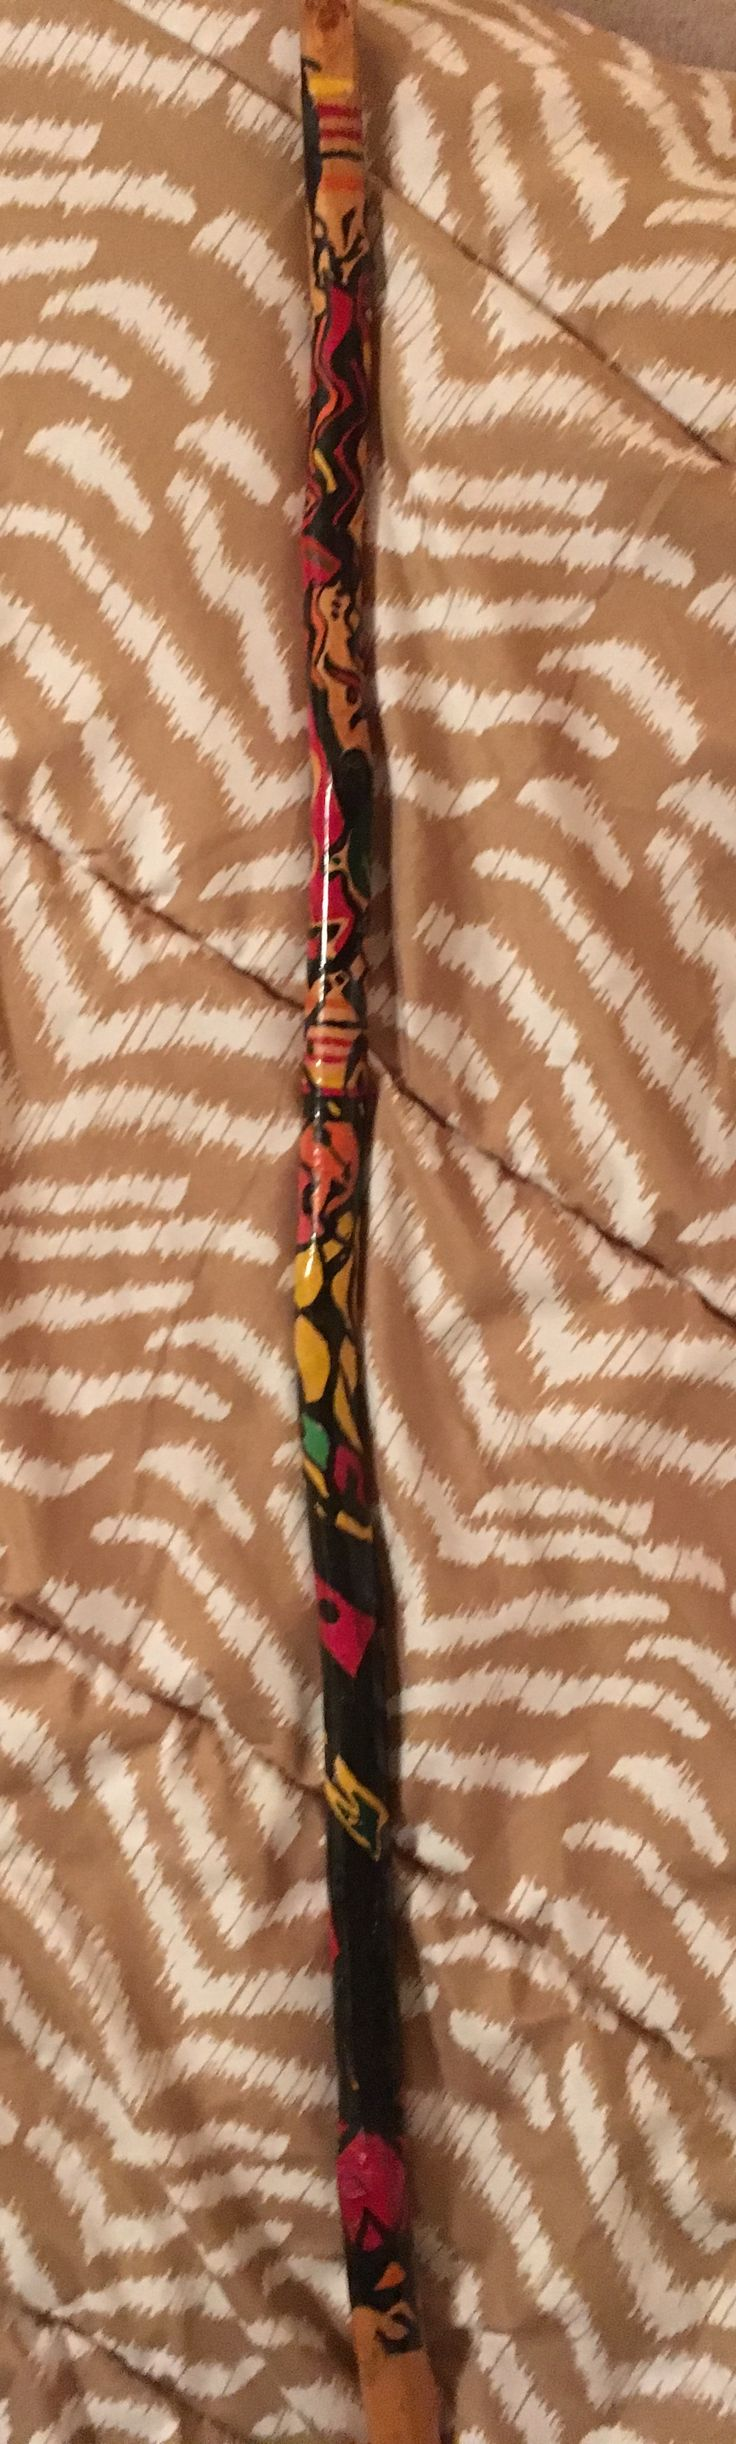 Walking stick I painted